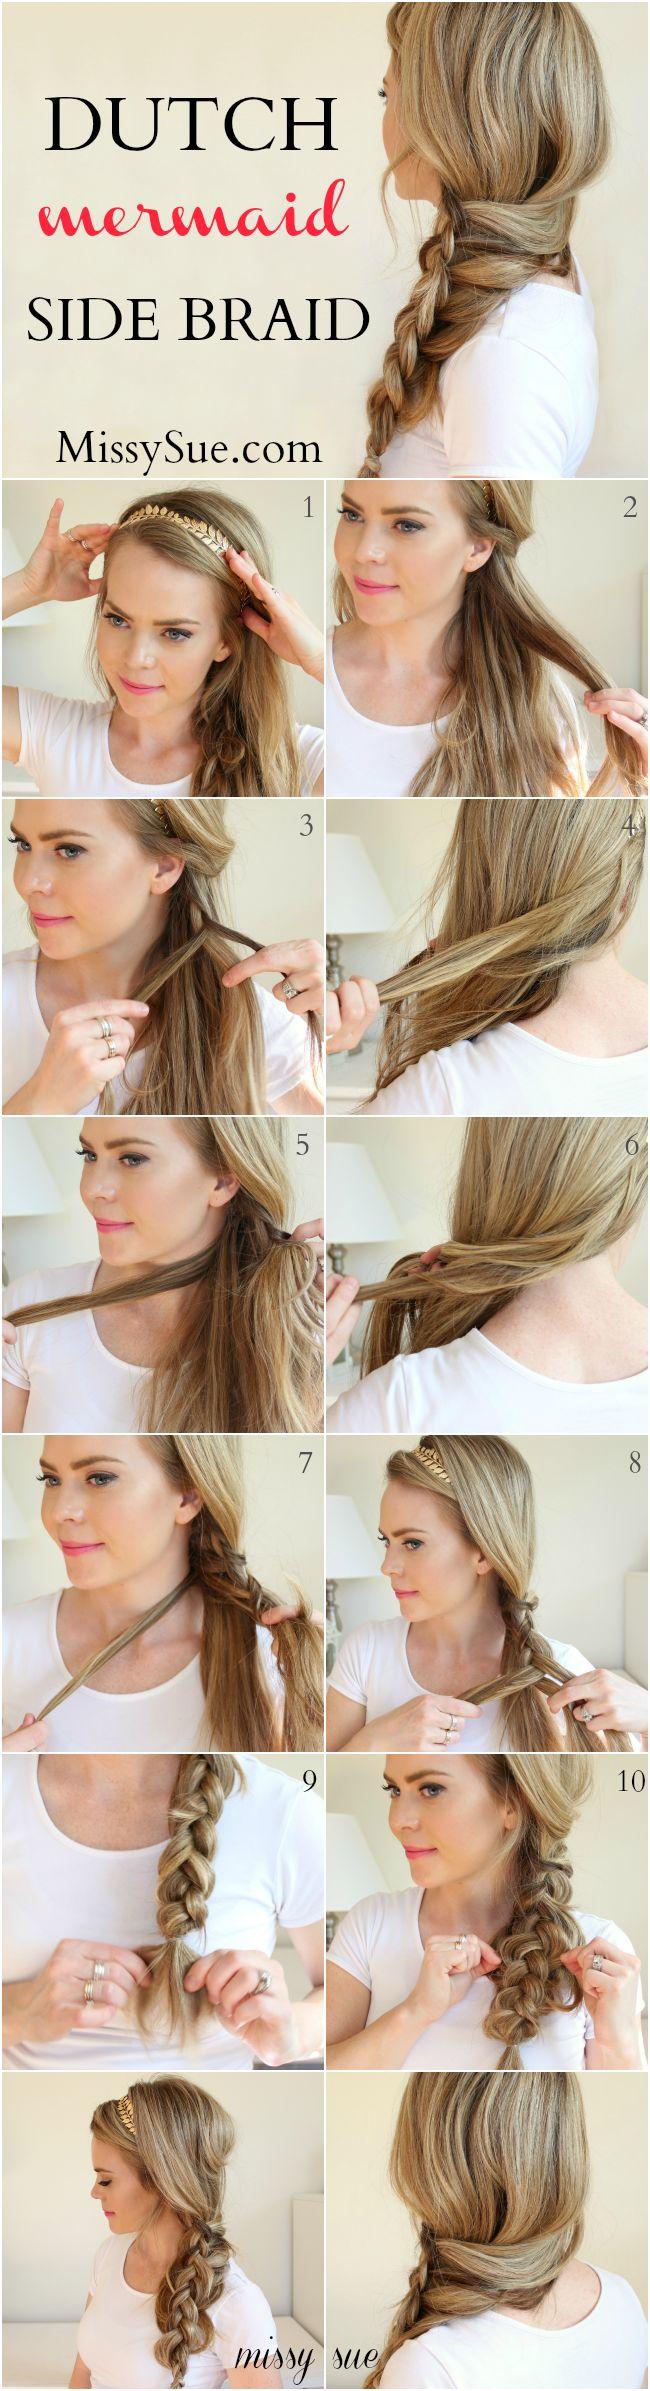 Fine 1000 Ideas About Mermaid Braid Tutorials On Pinterest Hair Hairstyle Inspiration Daily Dogsangcom